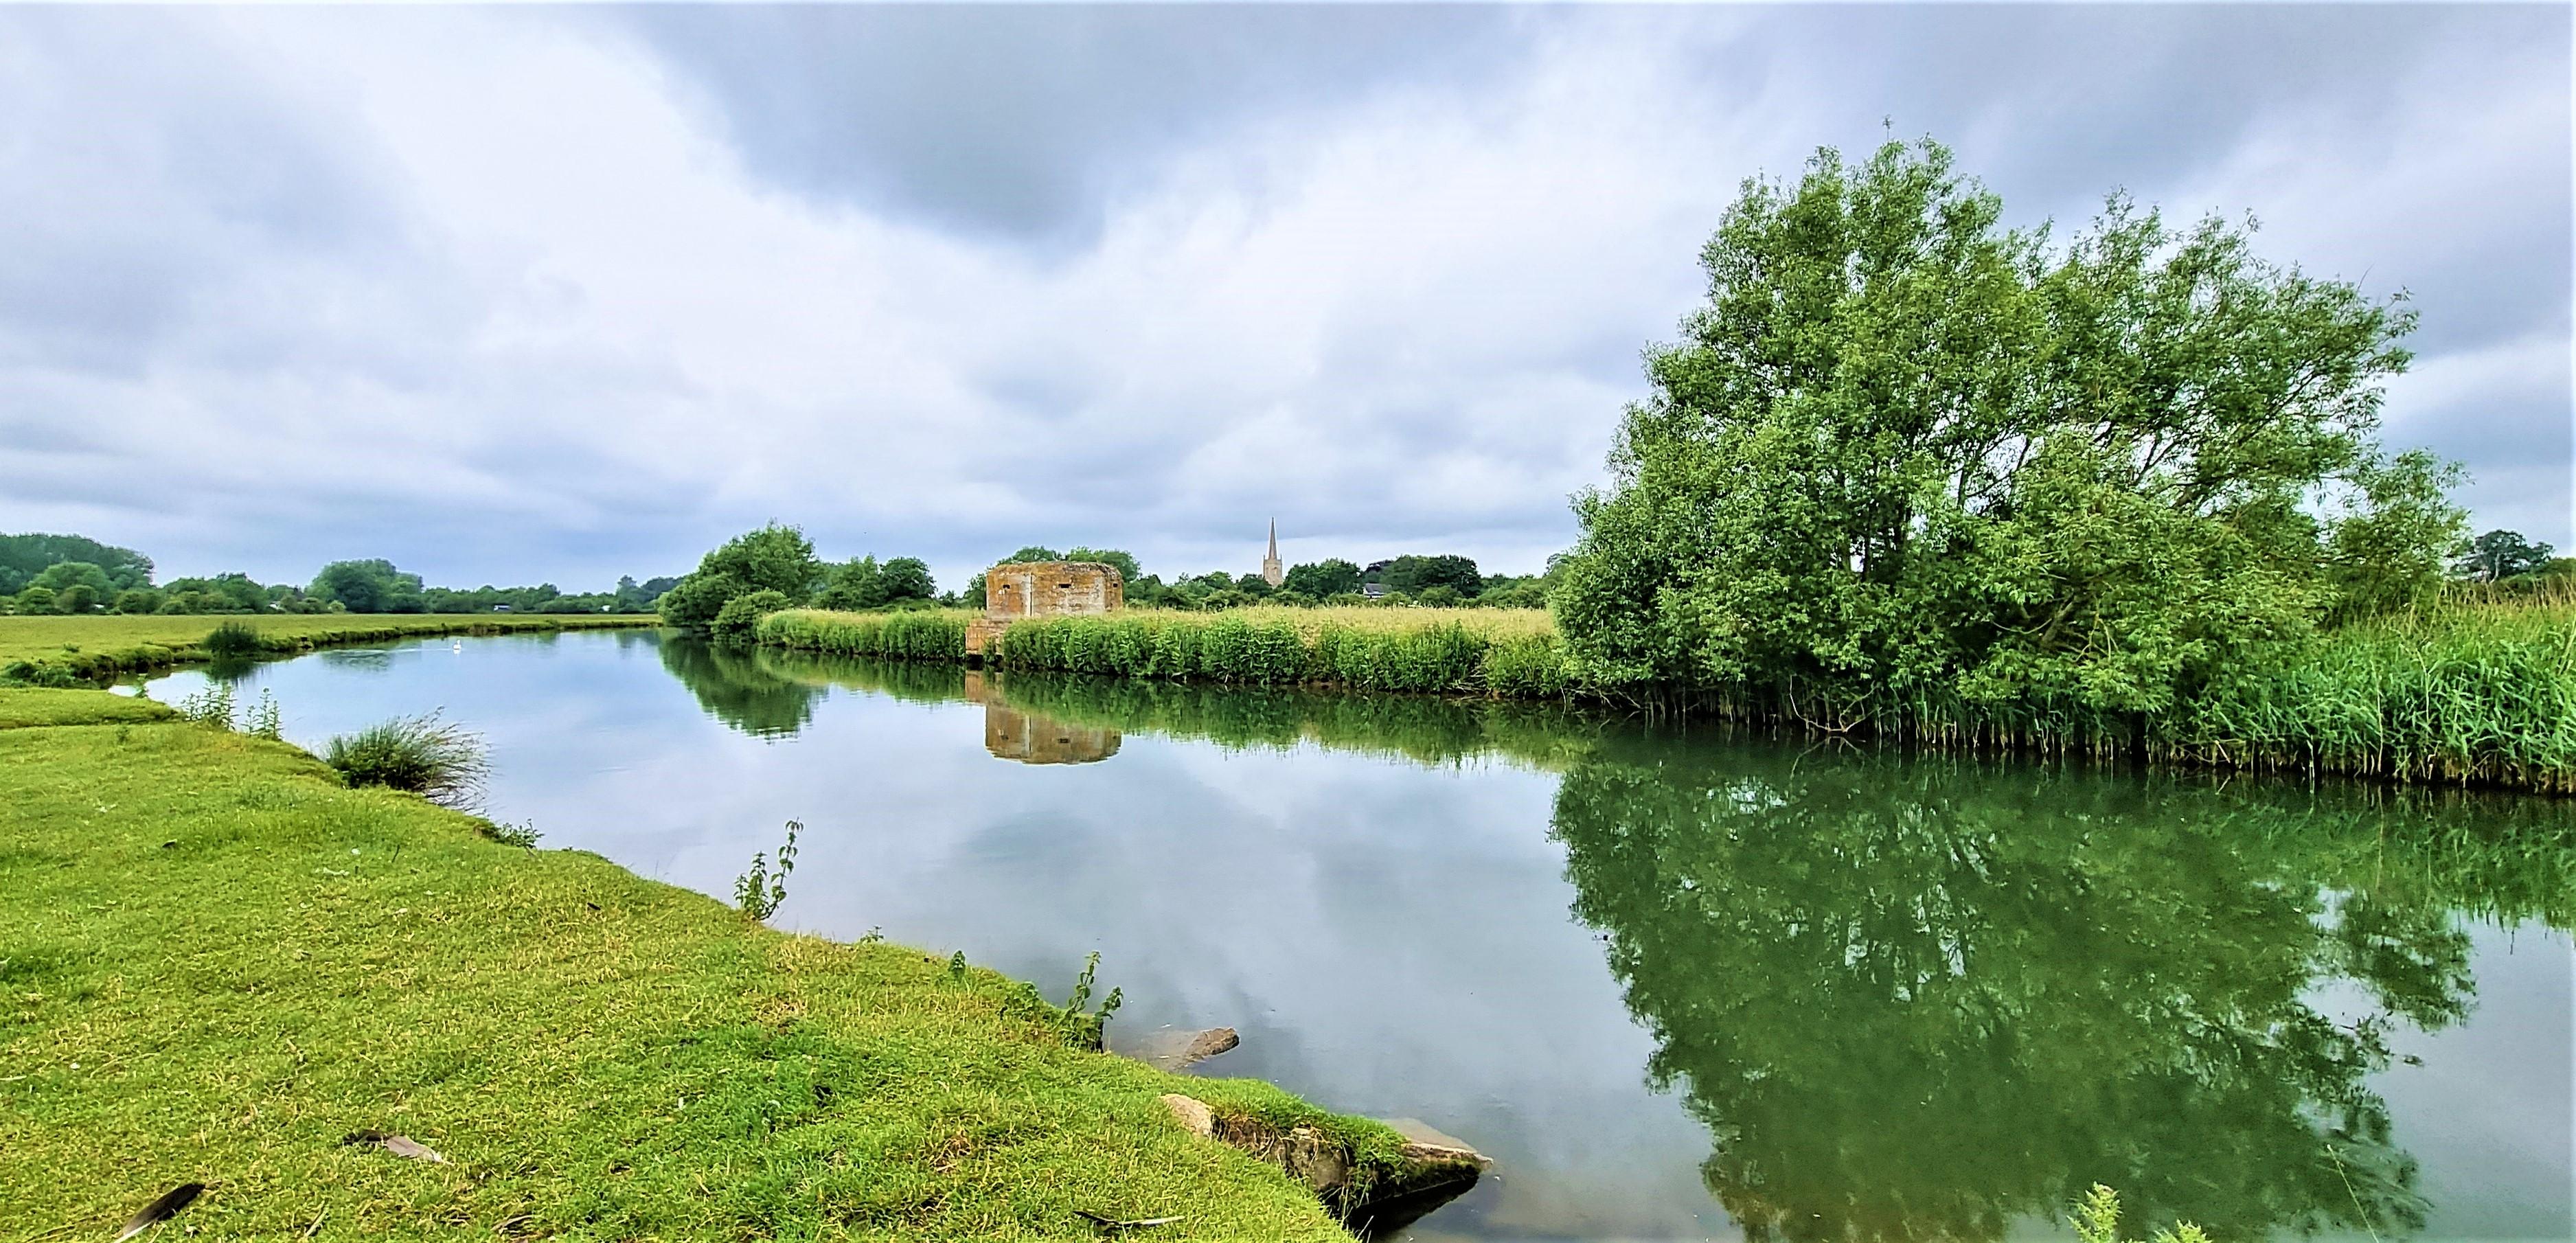 Thames Path: Lechlade to Newbridge